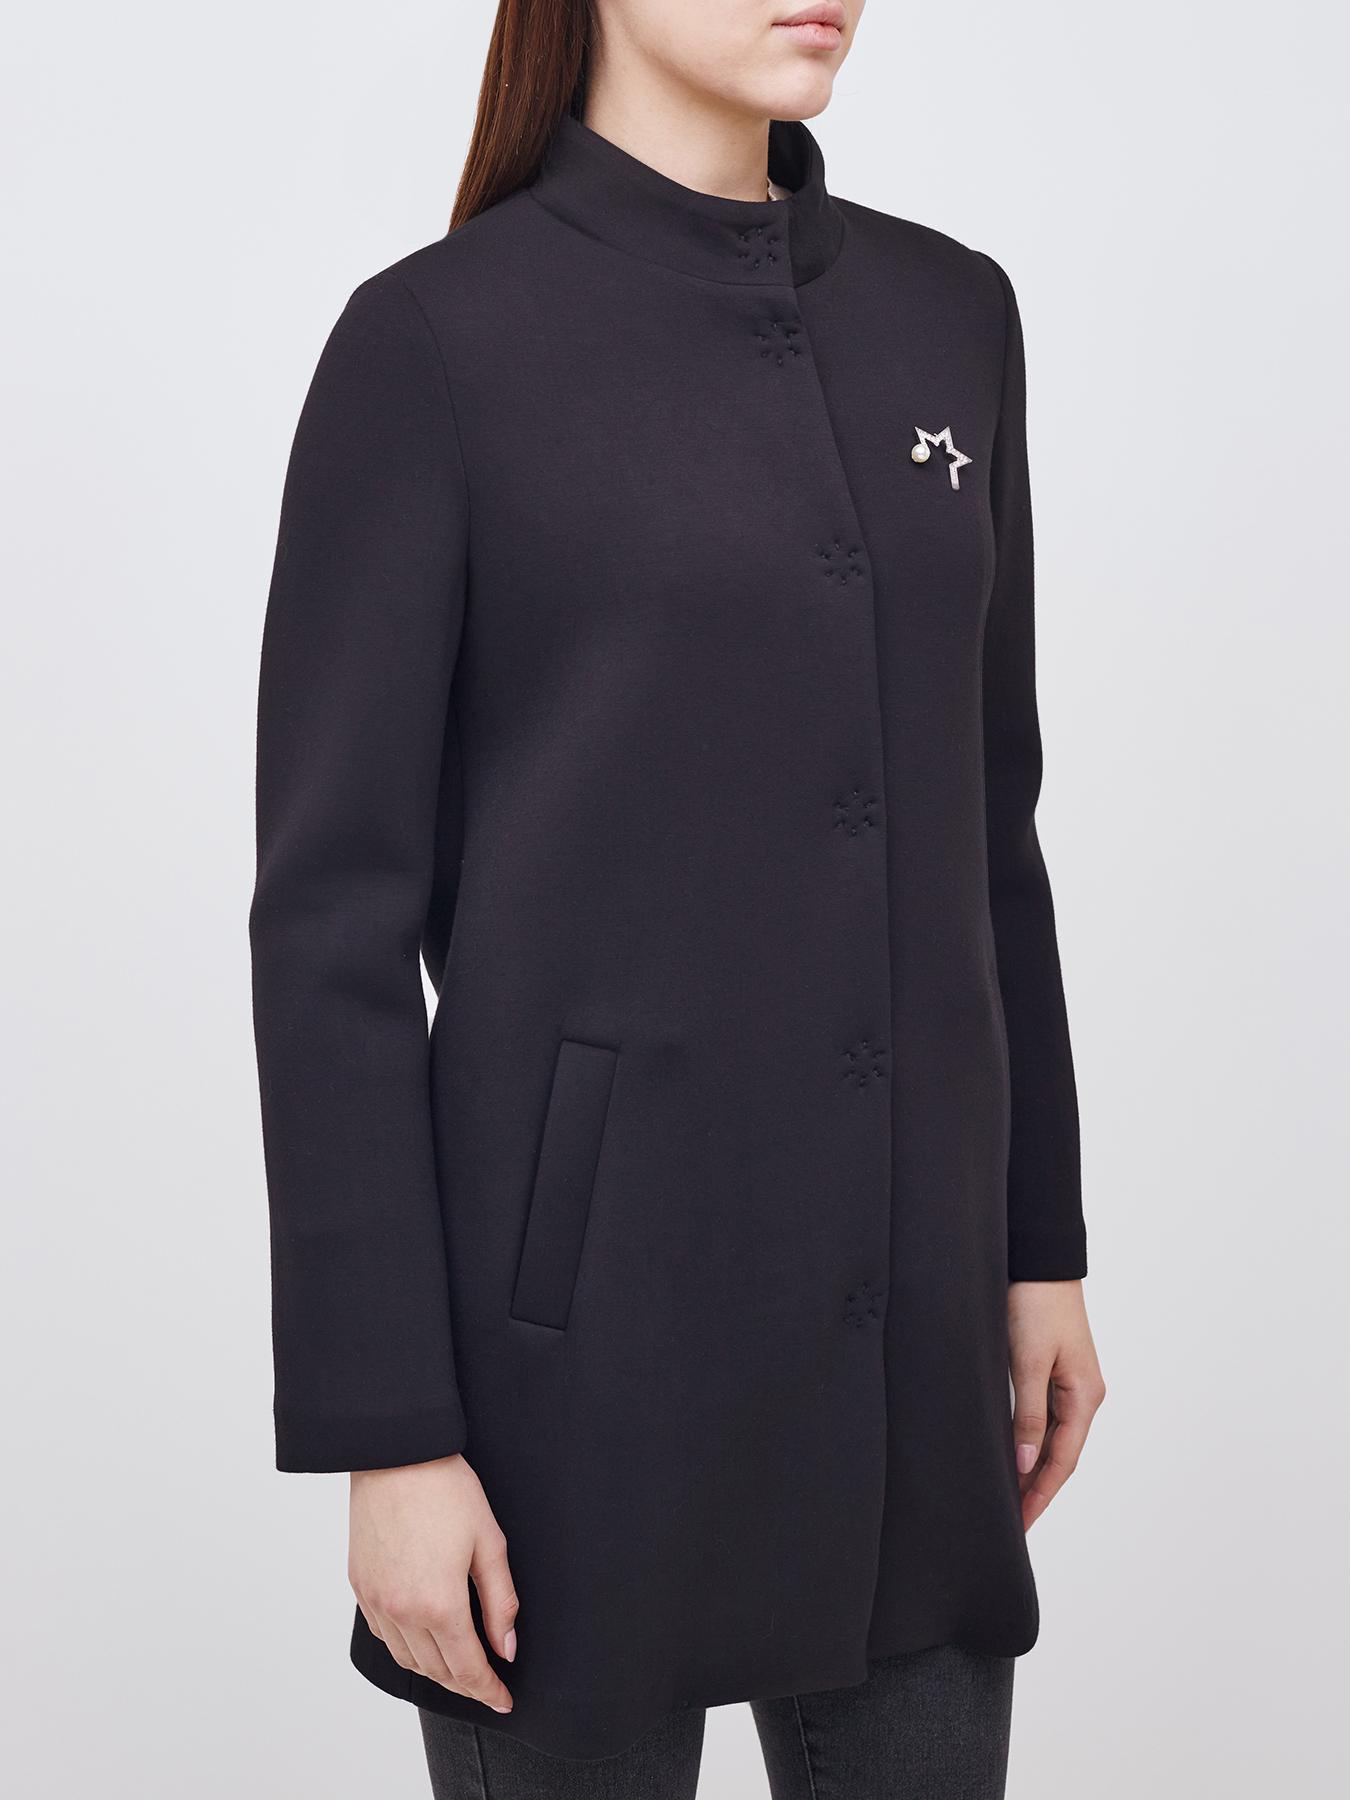 Пальто Liu Jo Пальто пальто liu jo р 40 it 44 ru